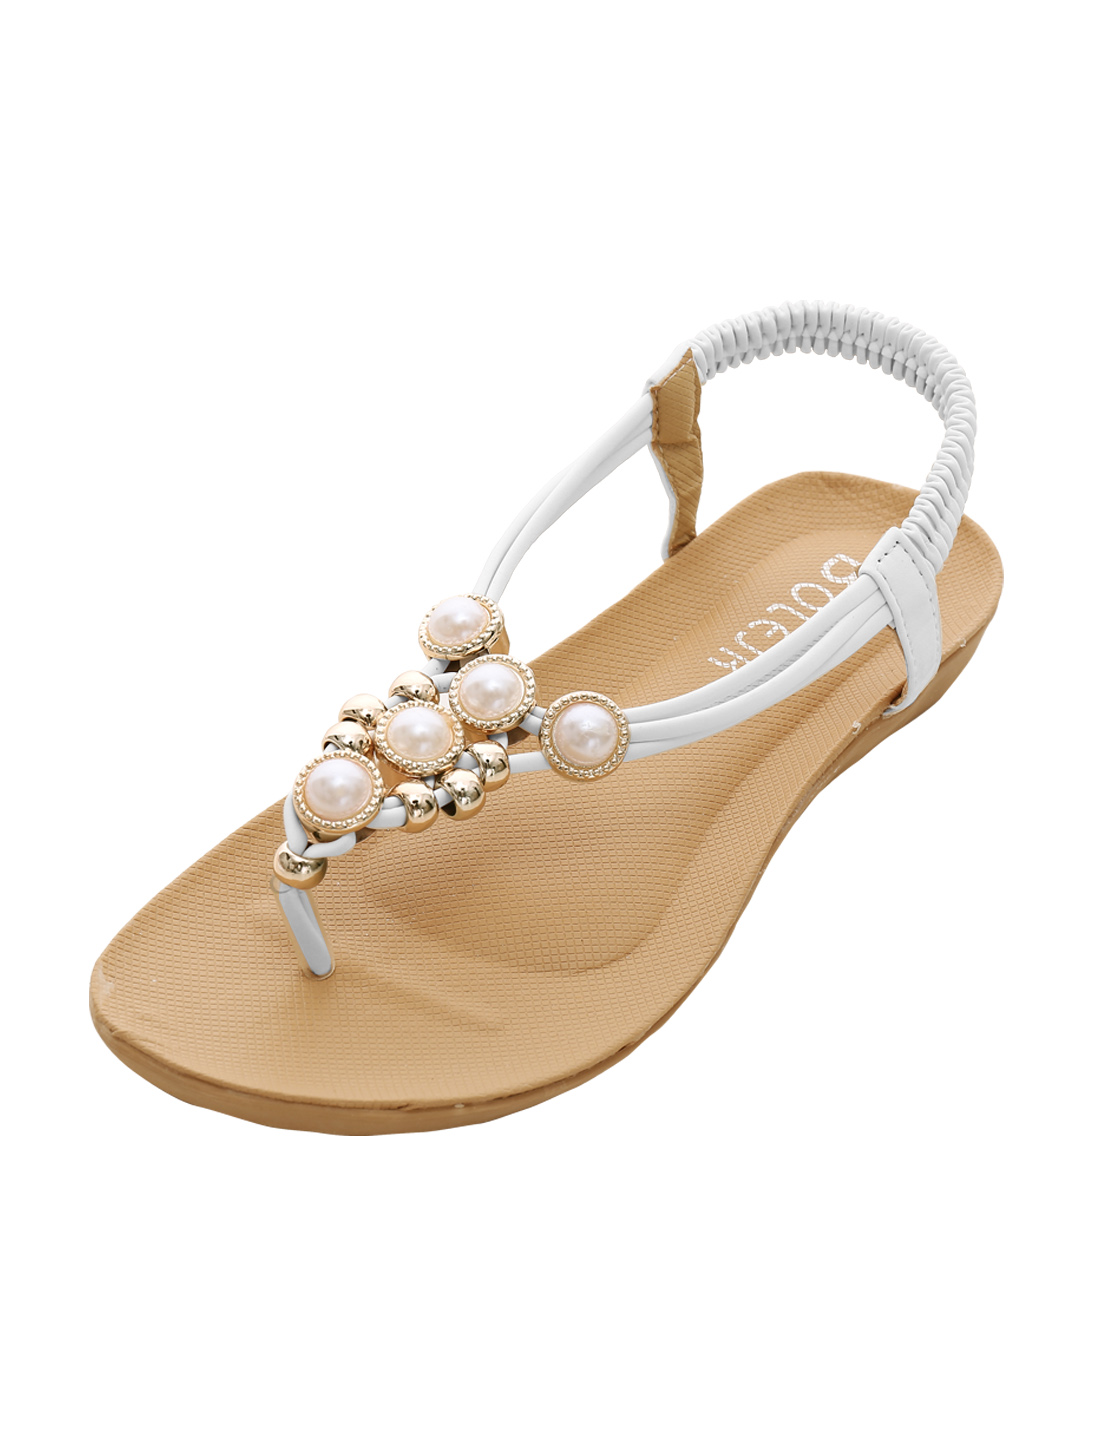 Women Elastic Ankle Strap Toe Post Summer Sandals White US 5.5